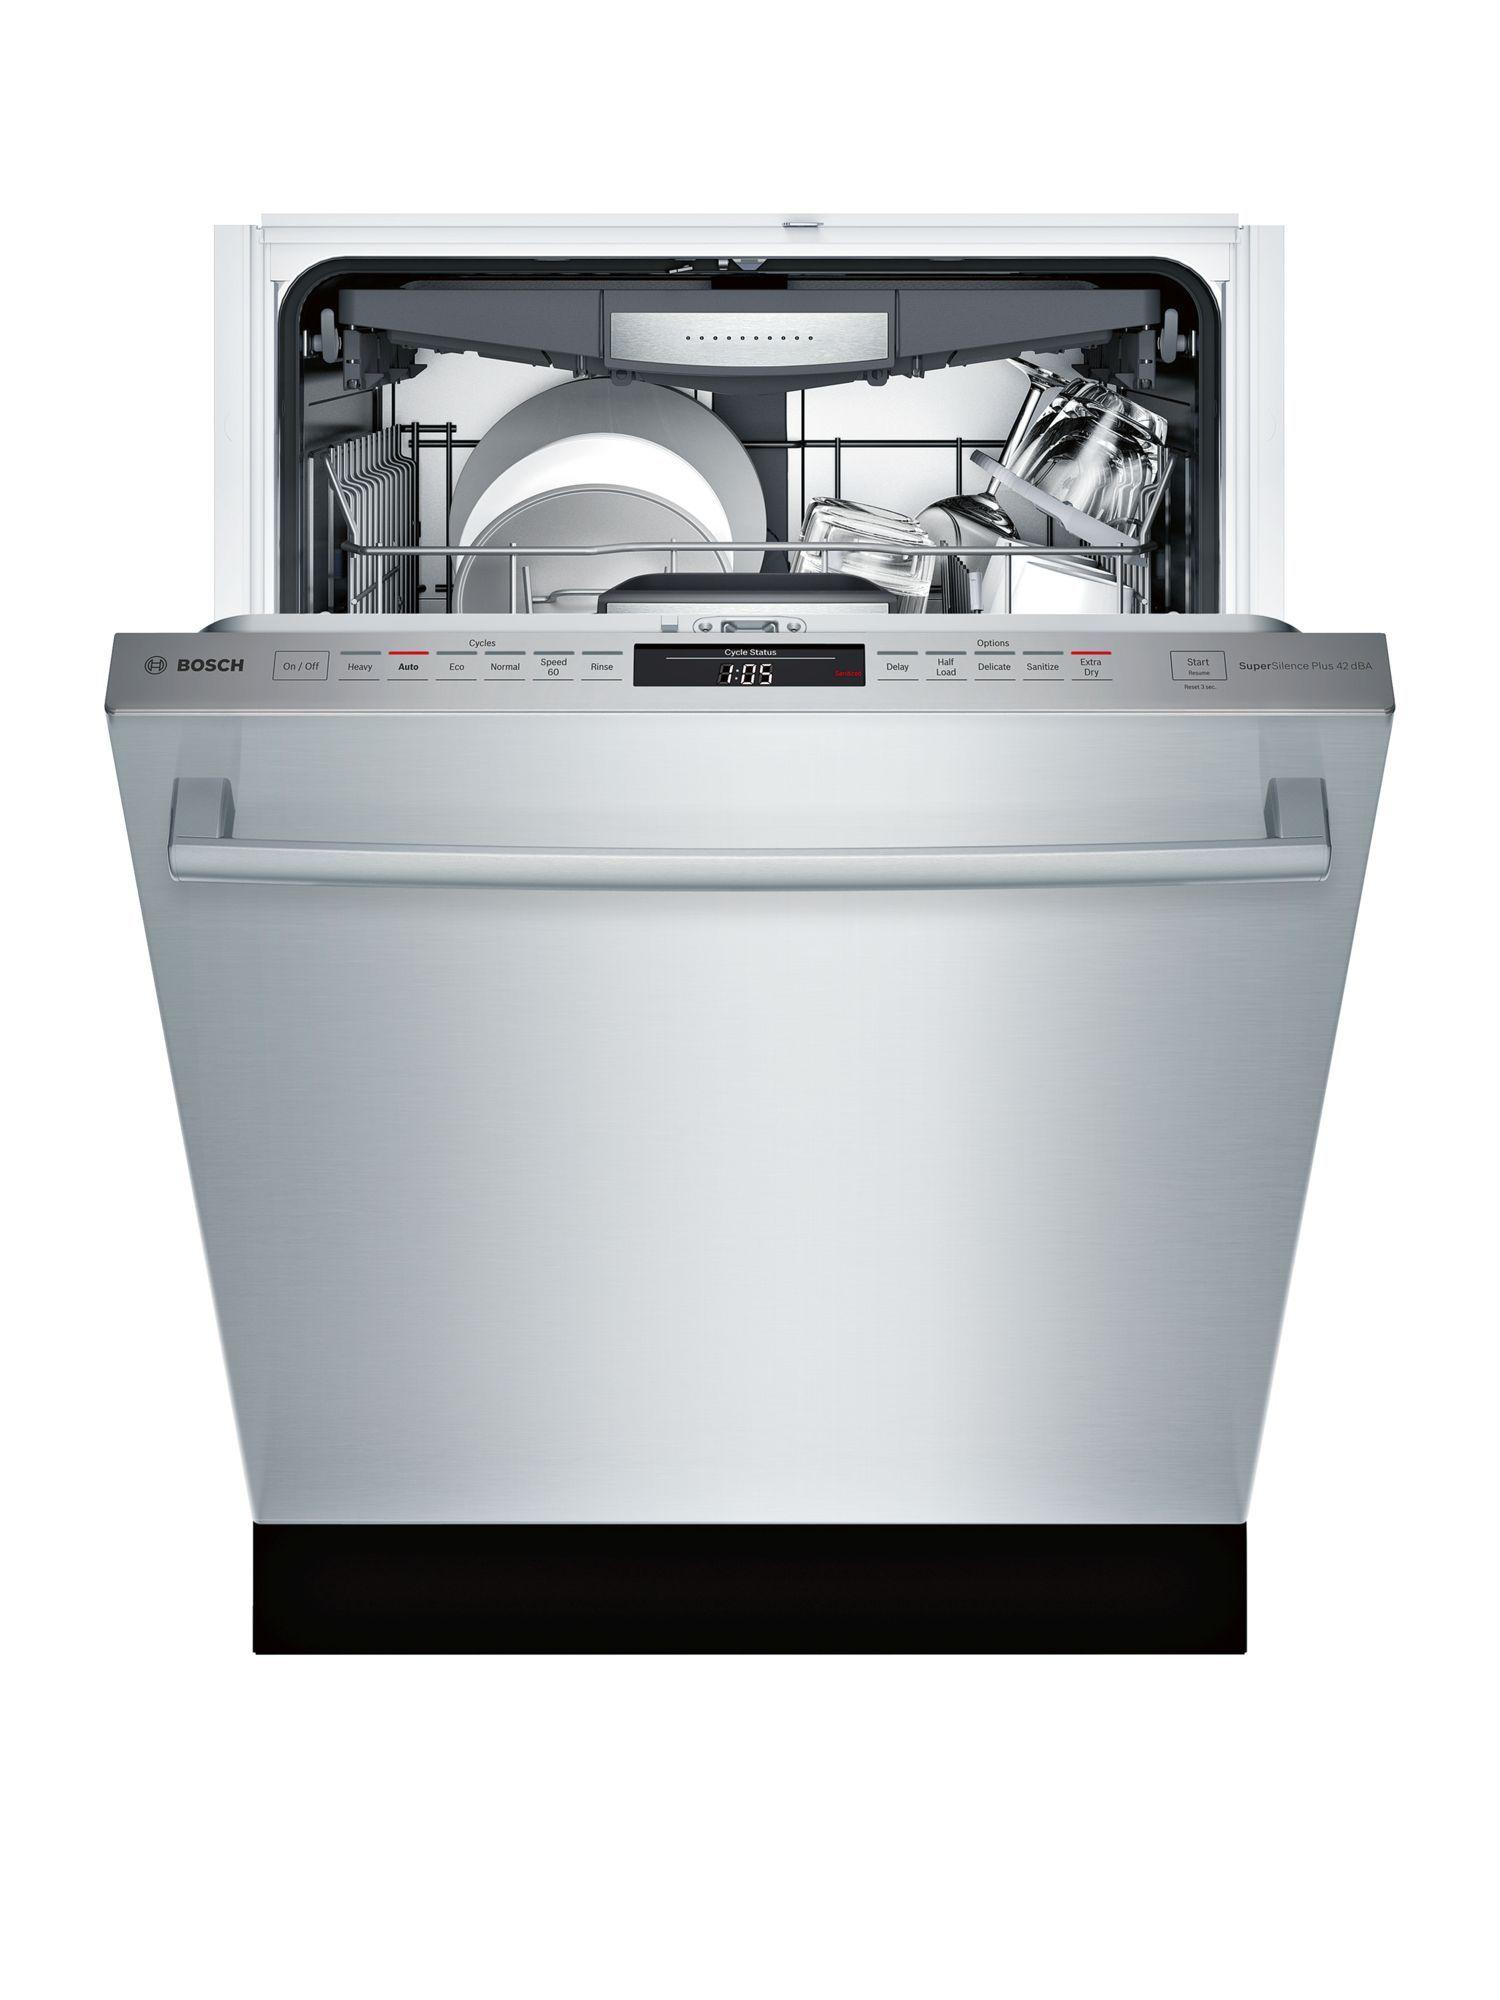 24 Bar Handle Dishwasher Shxm78w55n Stainless Steel 800 Series